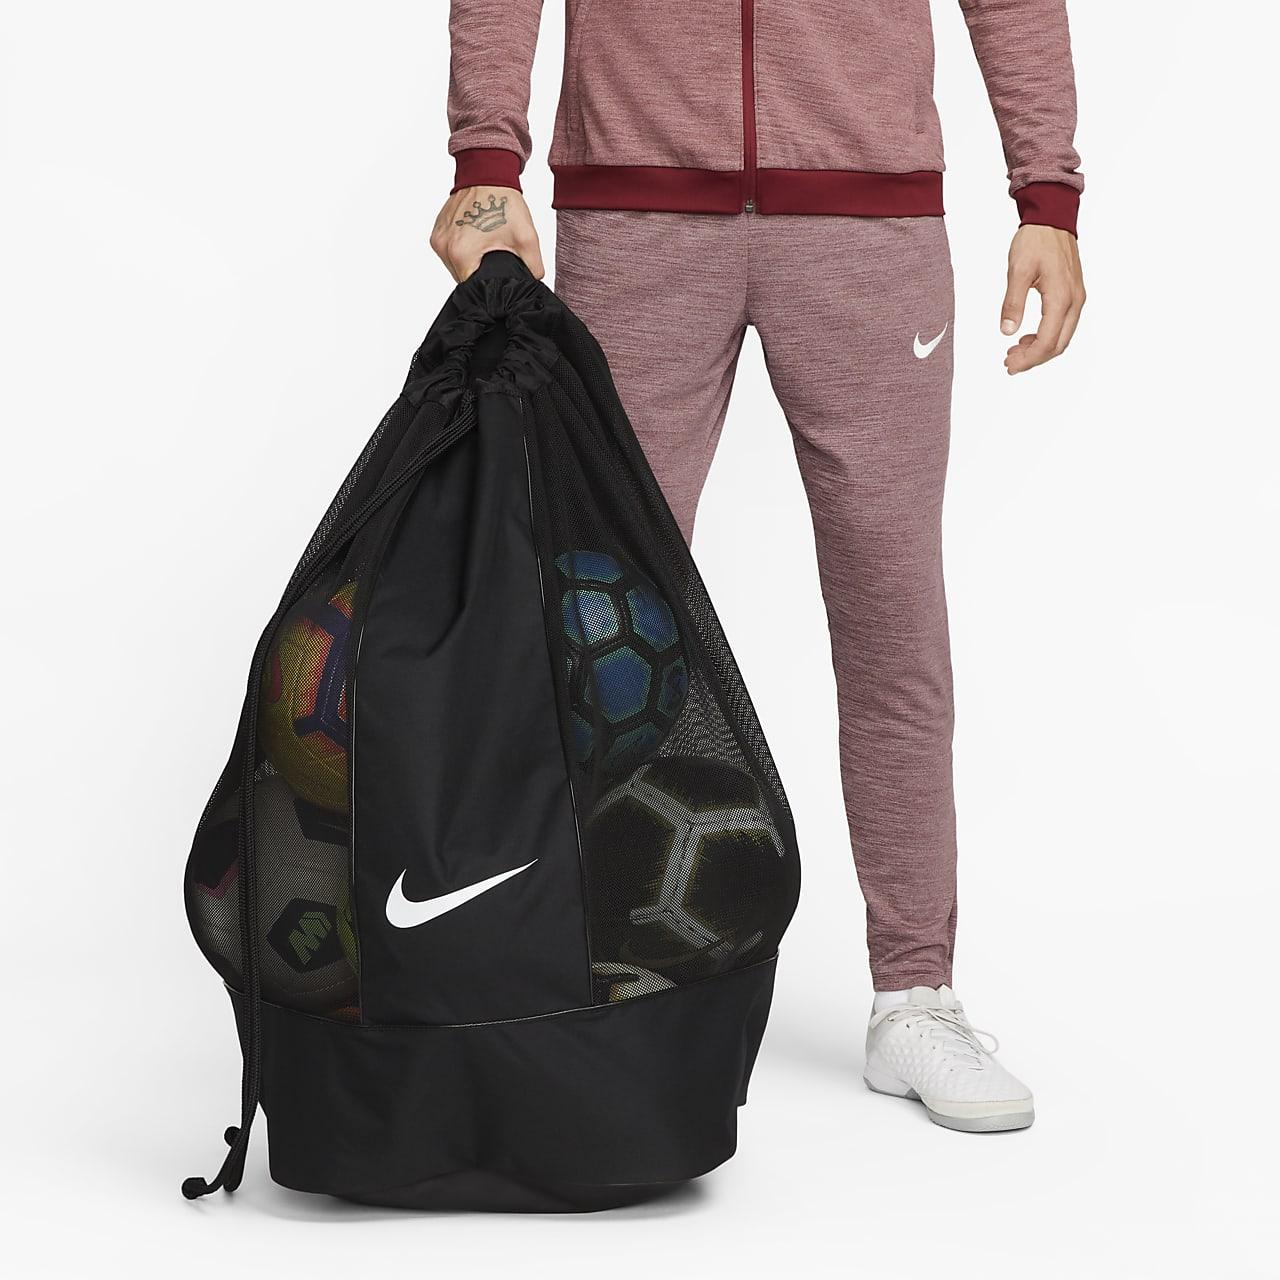 Nike Club Team Soccer Ball Bag